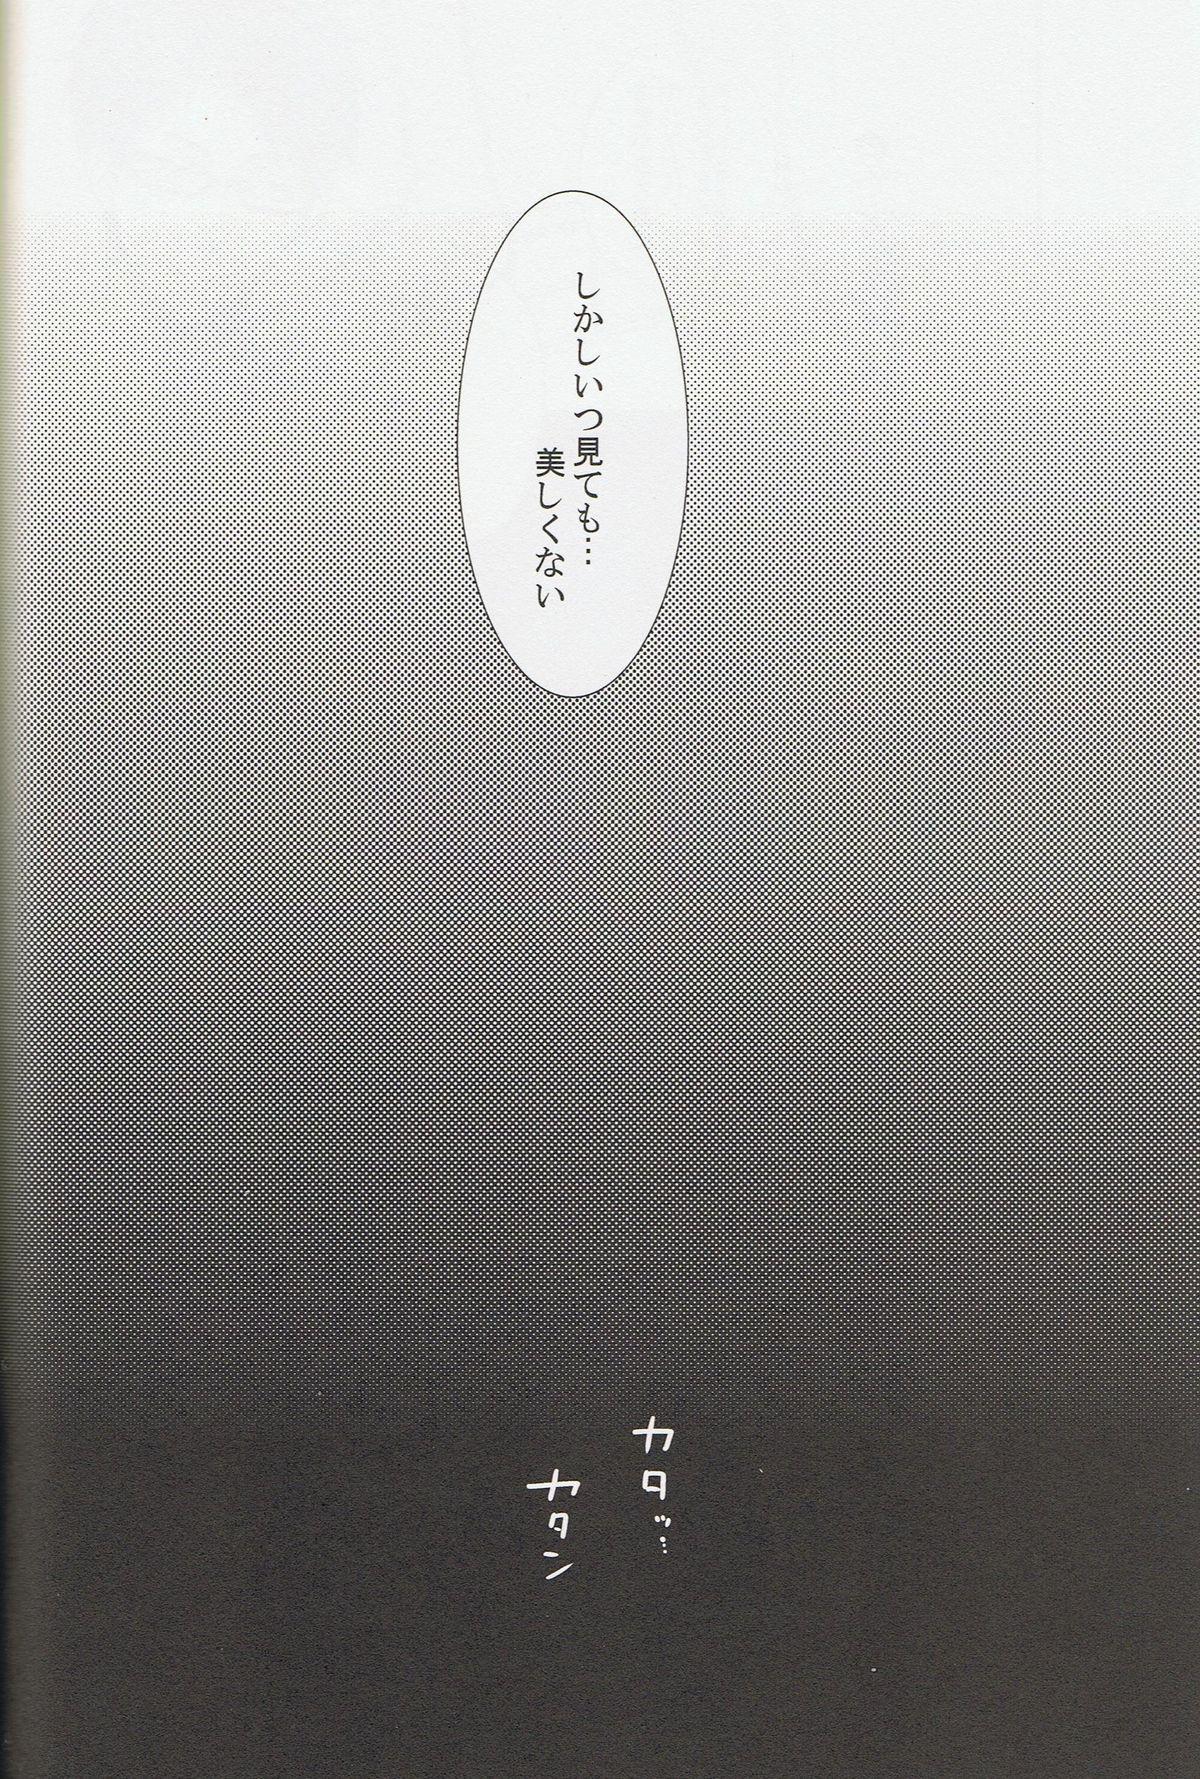 Furikaereba Iwatobi-chan 20